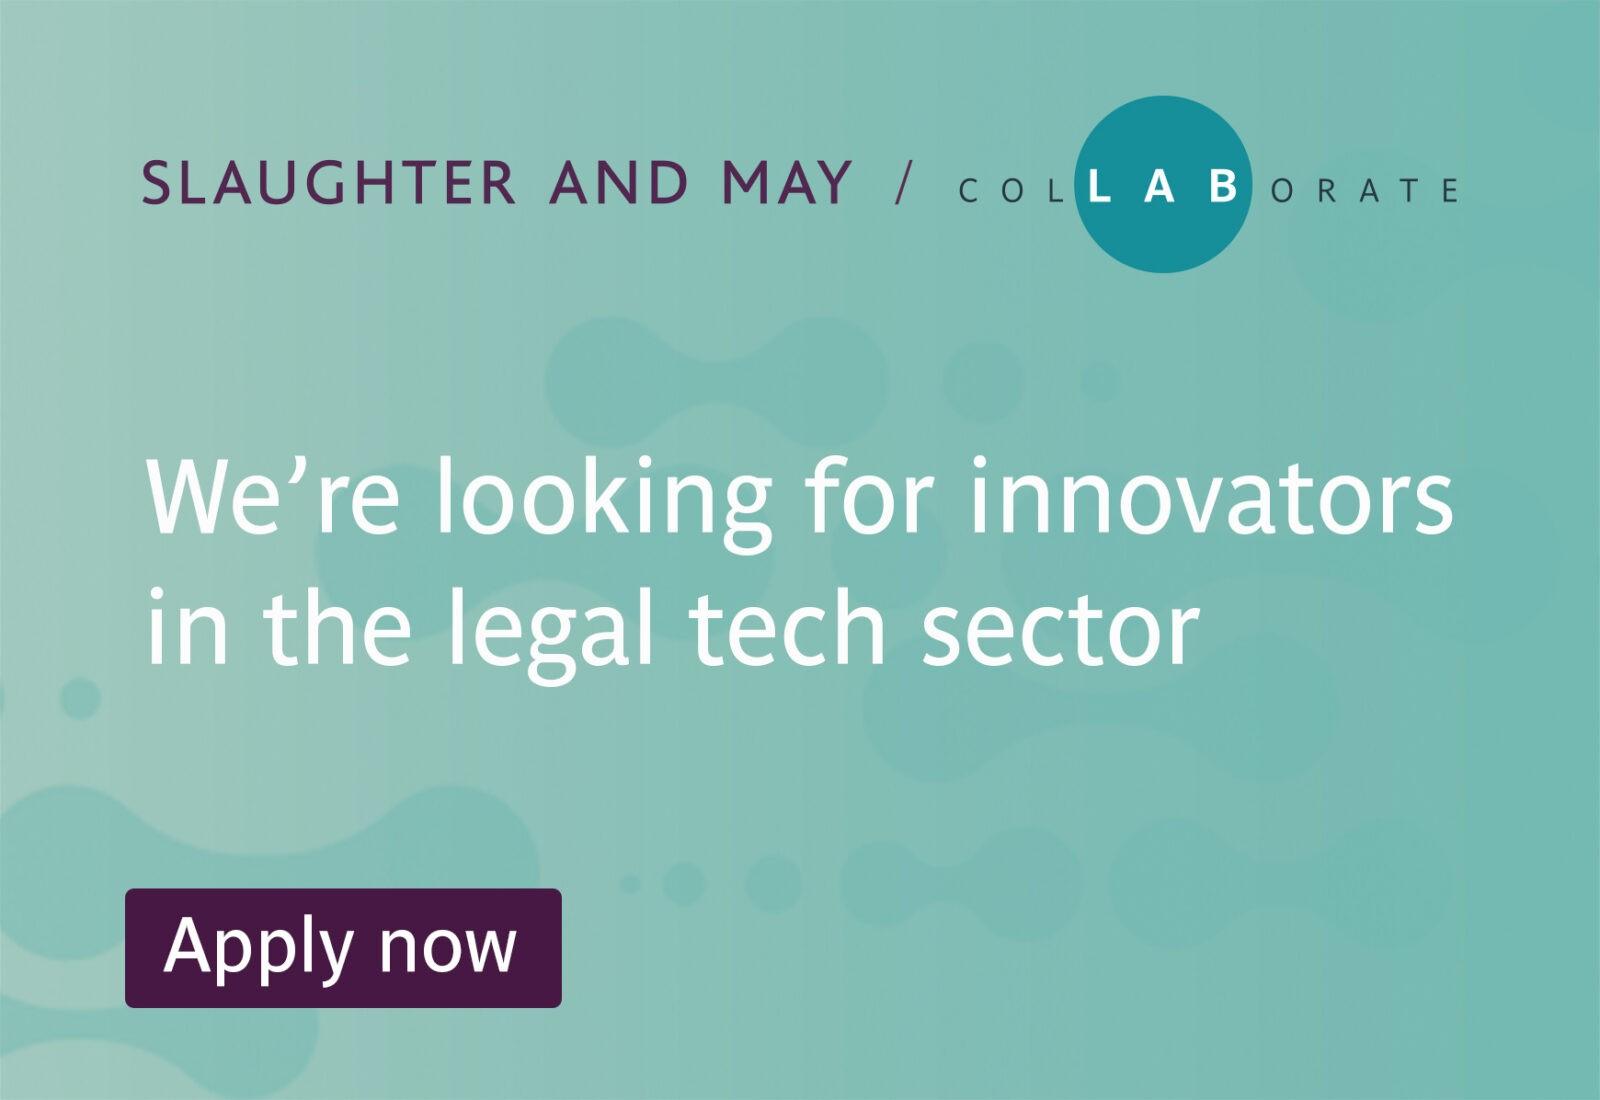 69288_Legal-Tech-Incubator_SM-Collaborate-Resize_v3